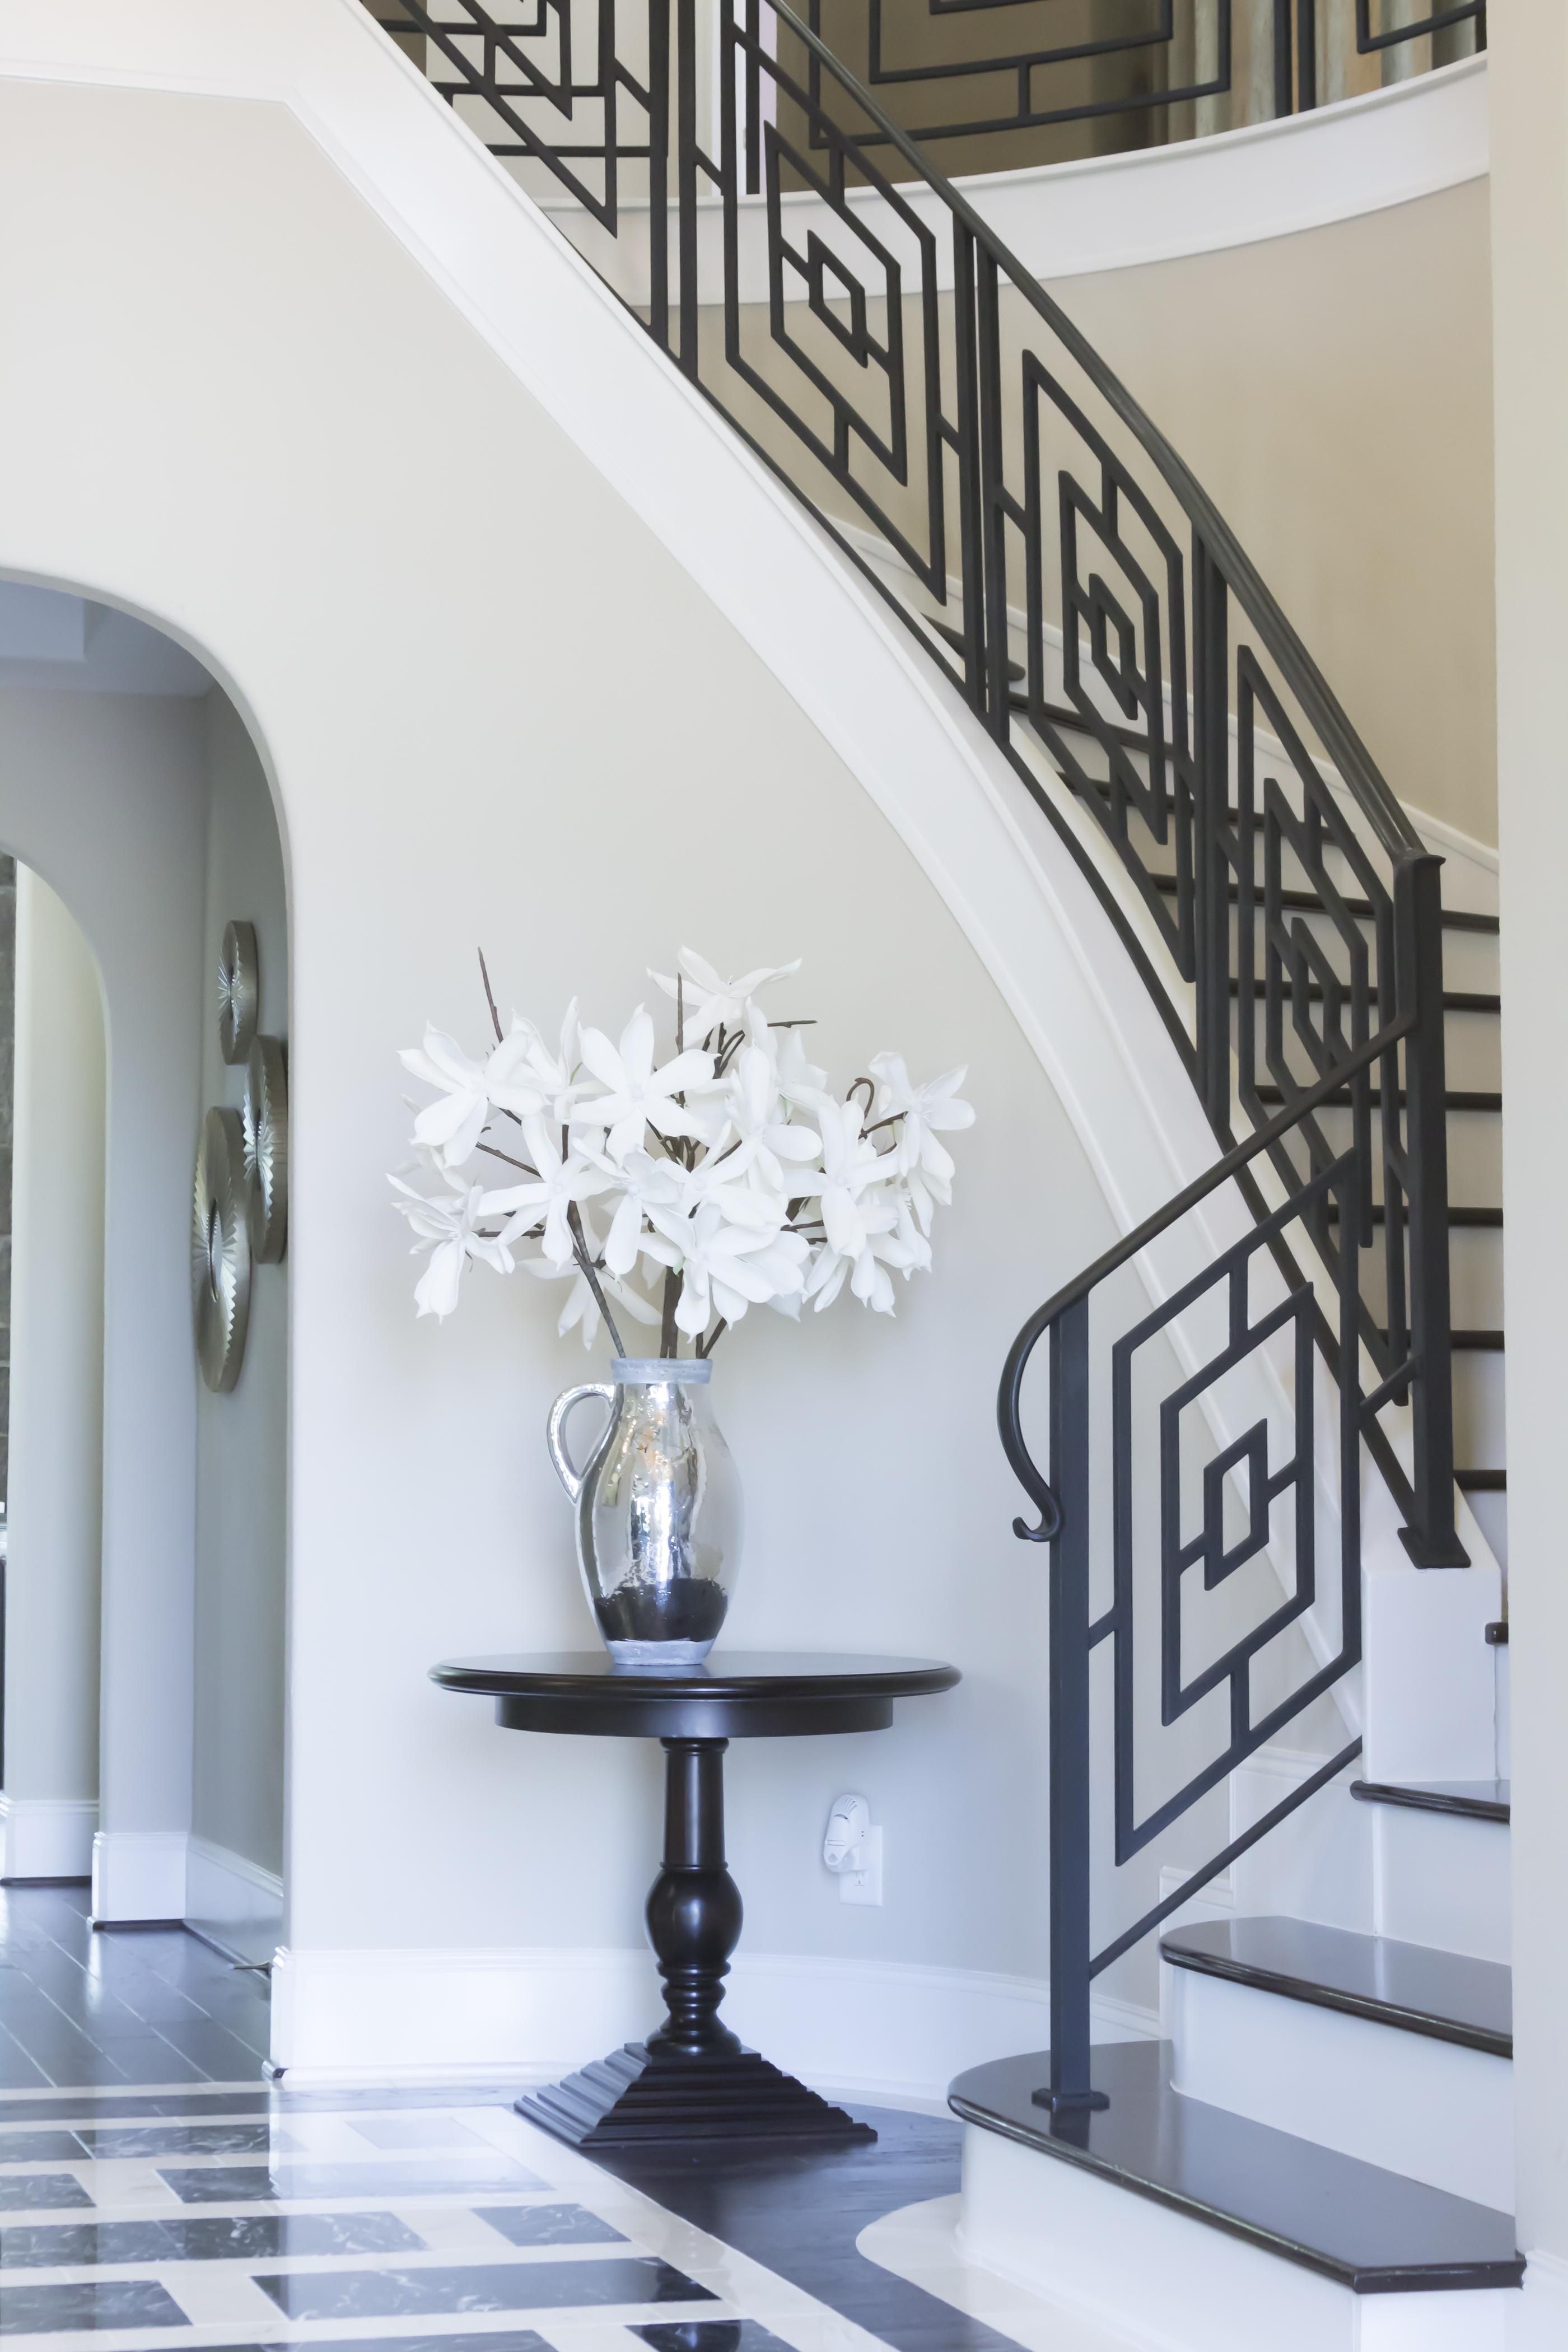 Custom Iron Staircase & Railing Idea Gallery